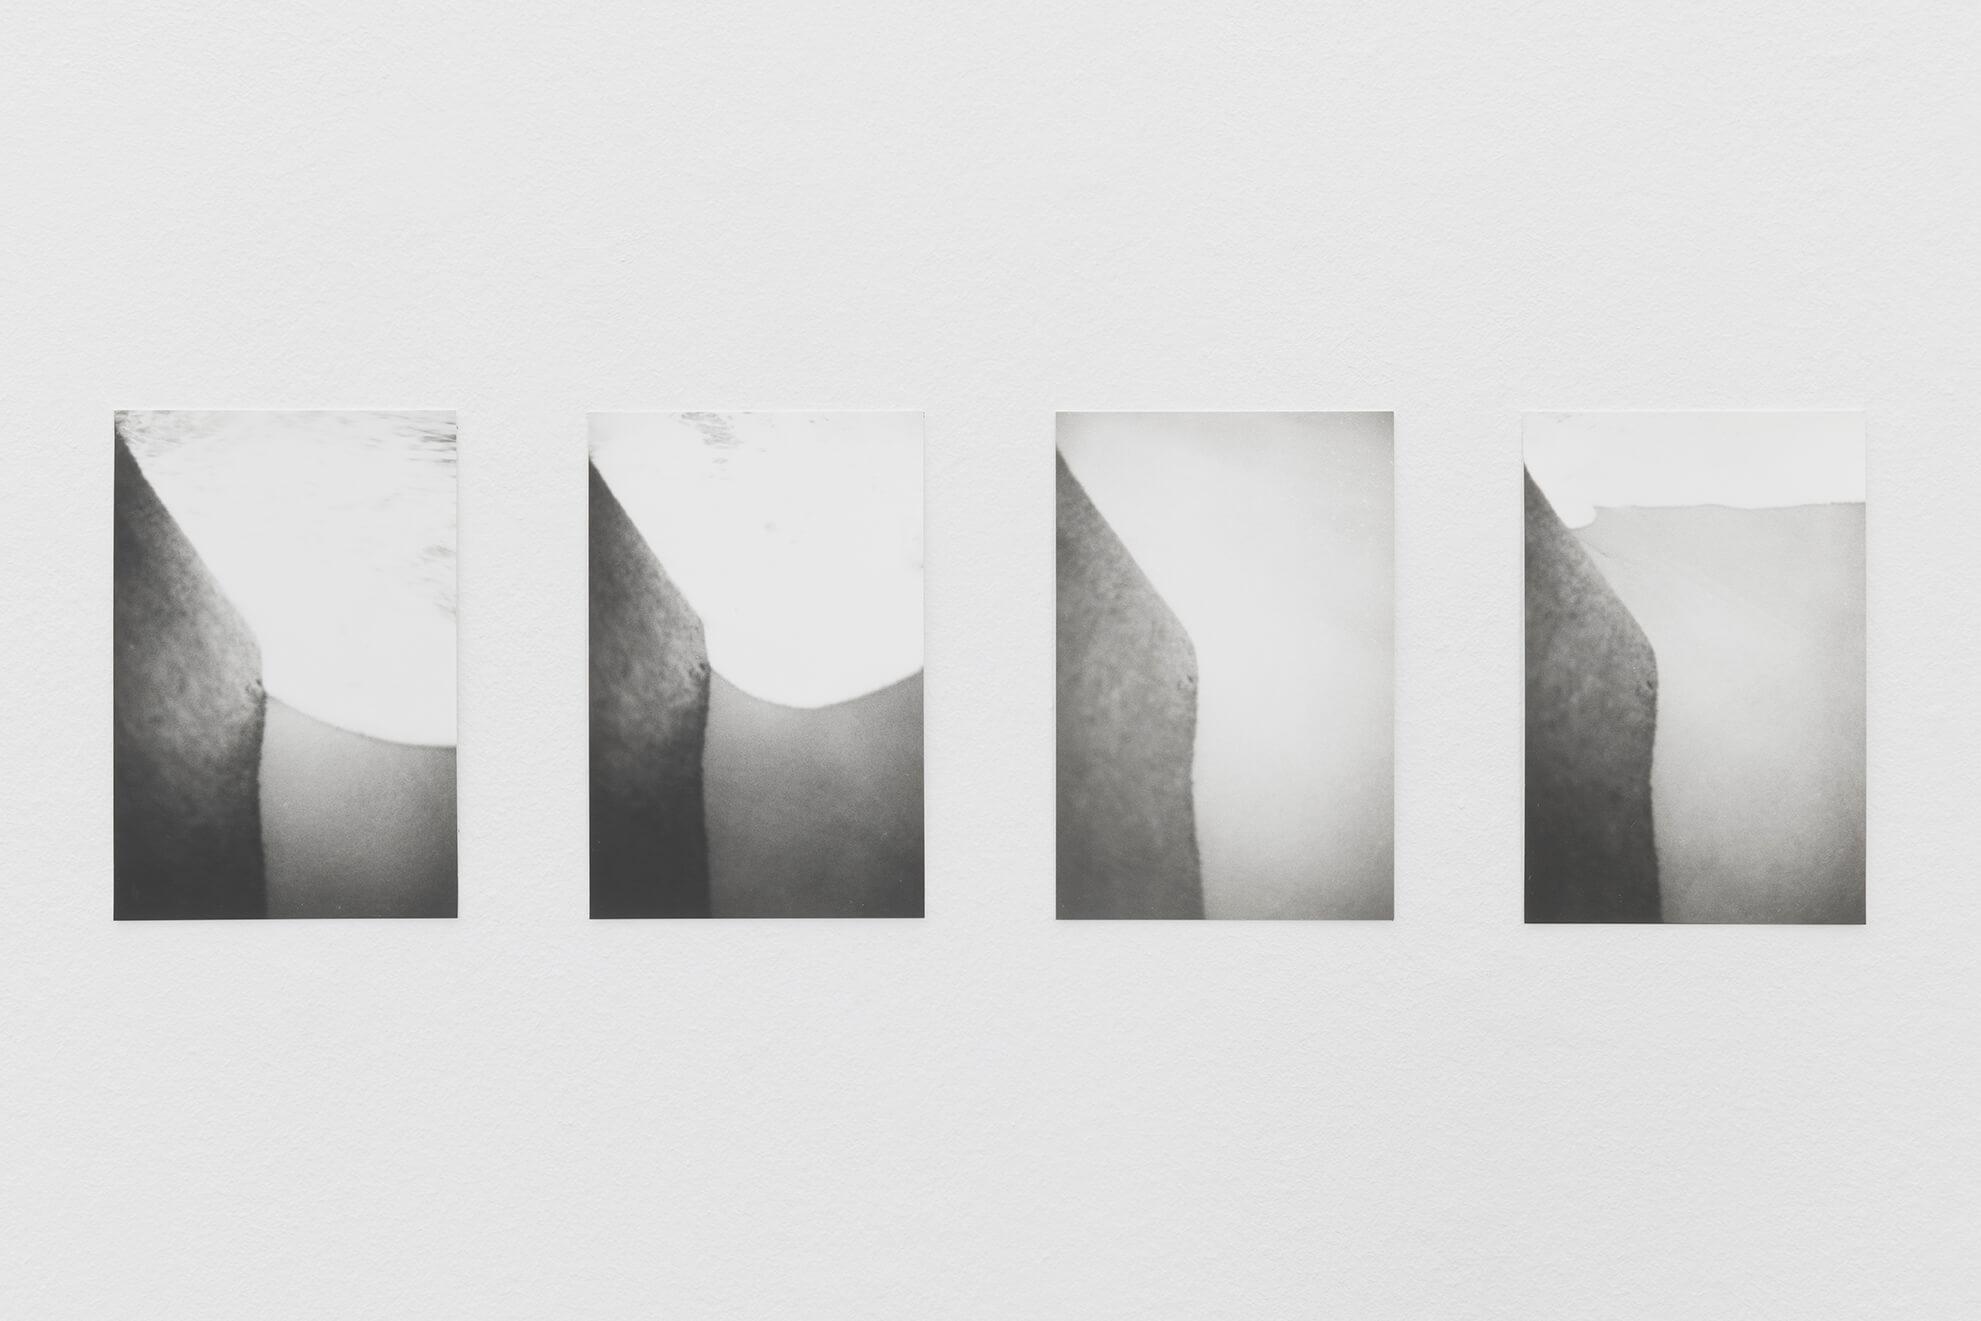 JOCHEN LEMPERT. Untitled (Atlantic Ocean), 2019 | El Museu Imaginari / El Museo Imaginario / The Imaginary Museum | ProjecteSD